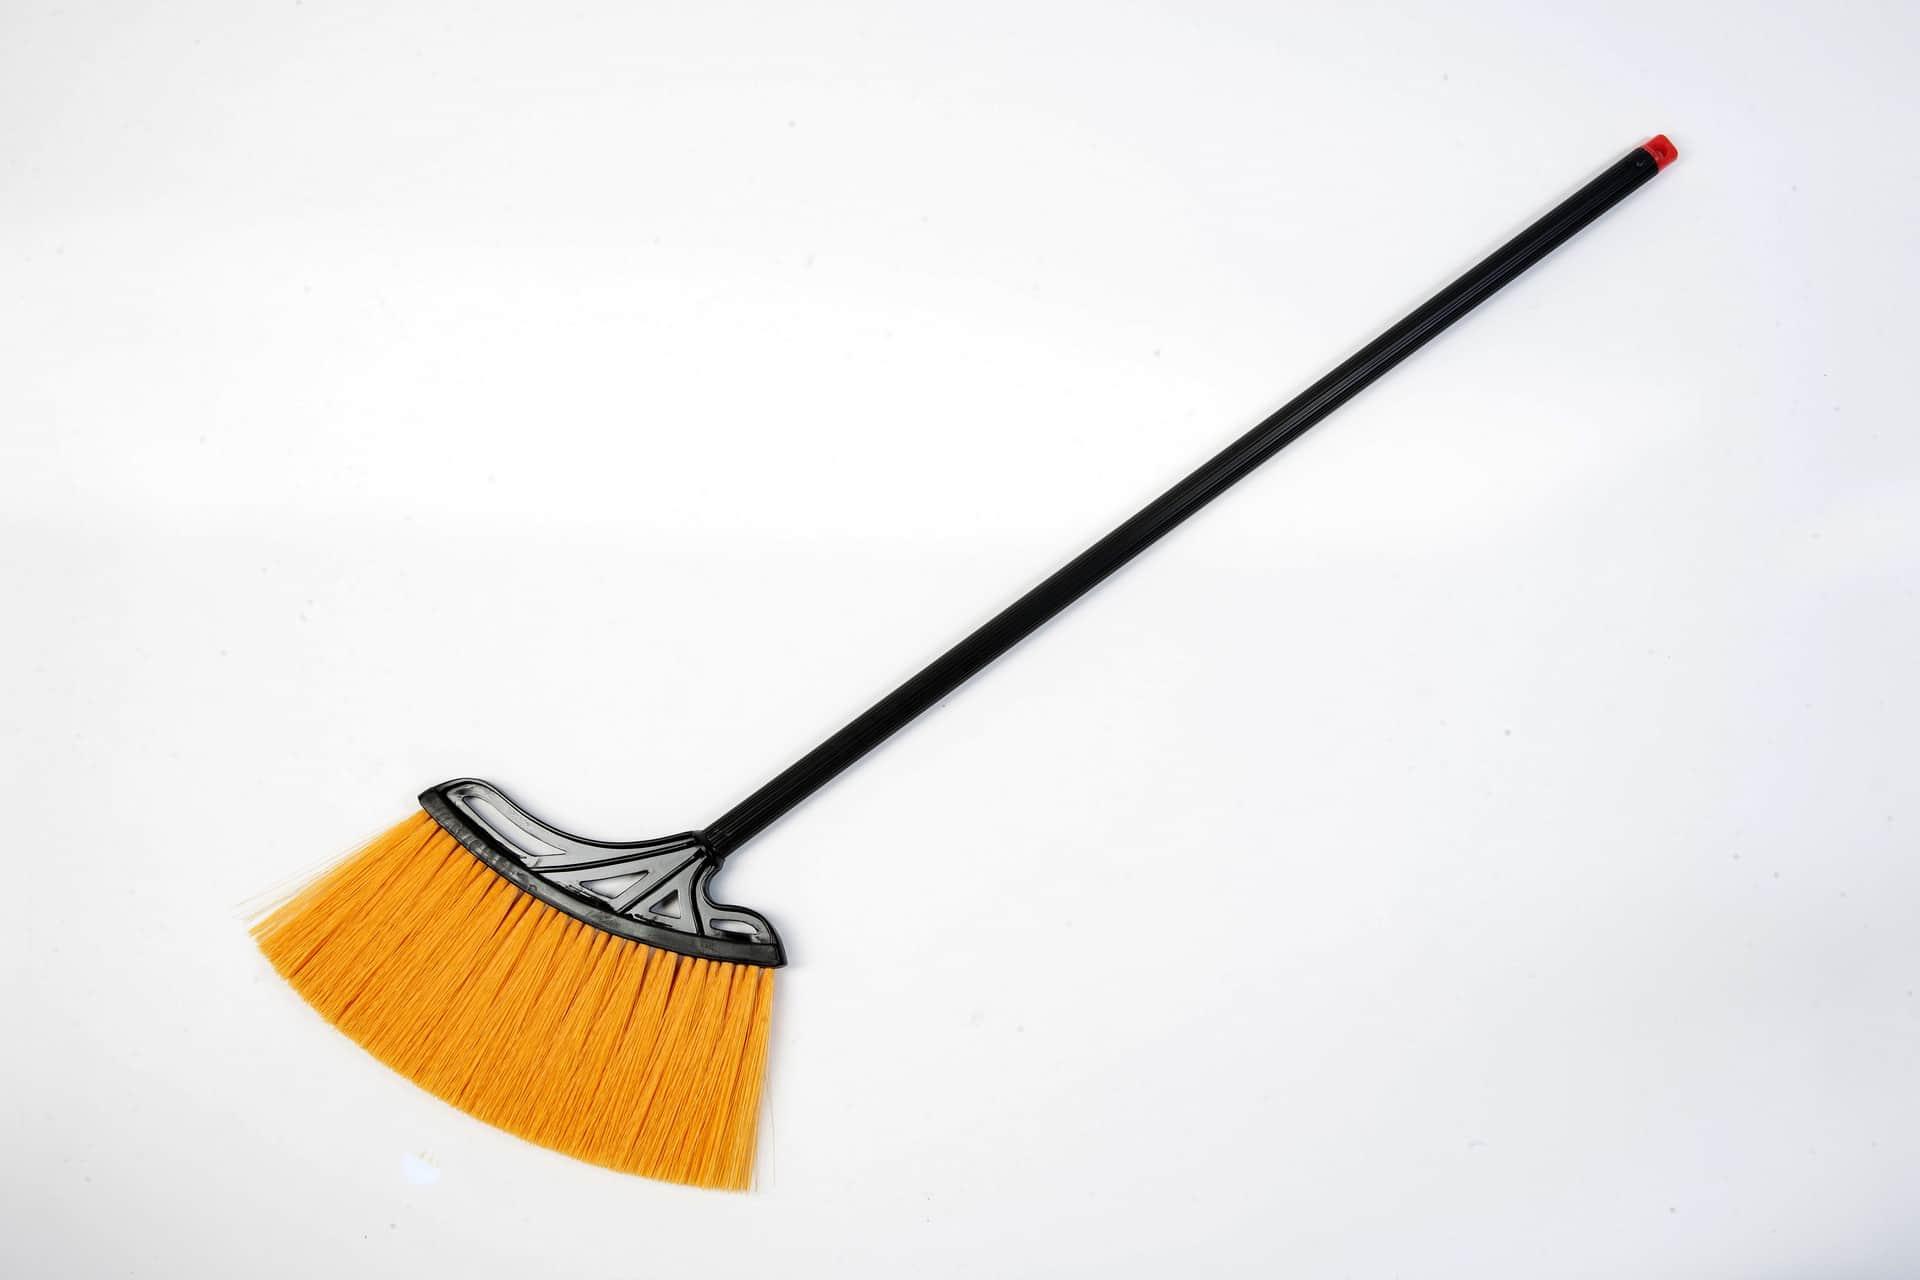 Champion Professional Champion Broom Soft Nylon Black